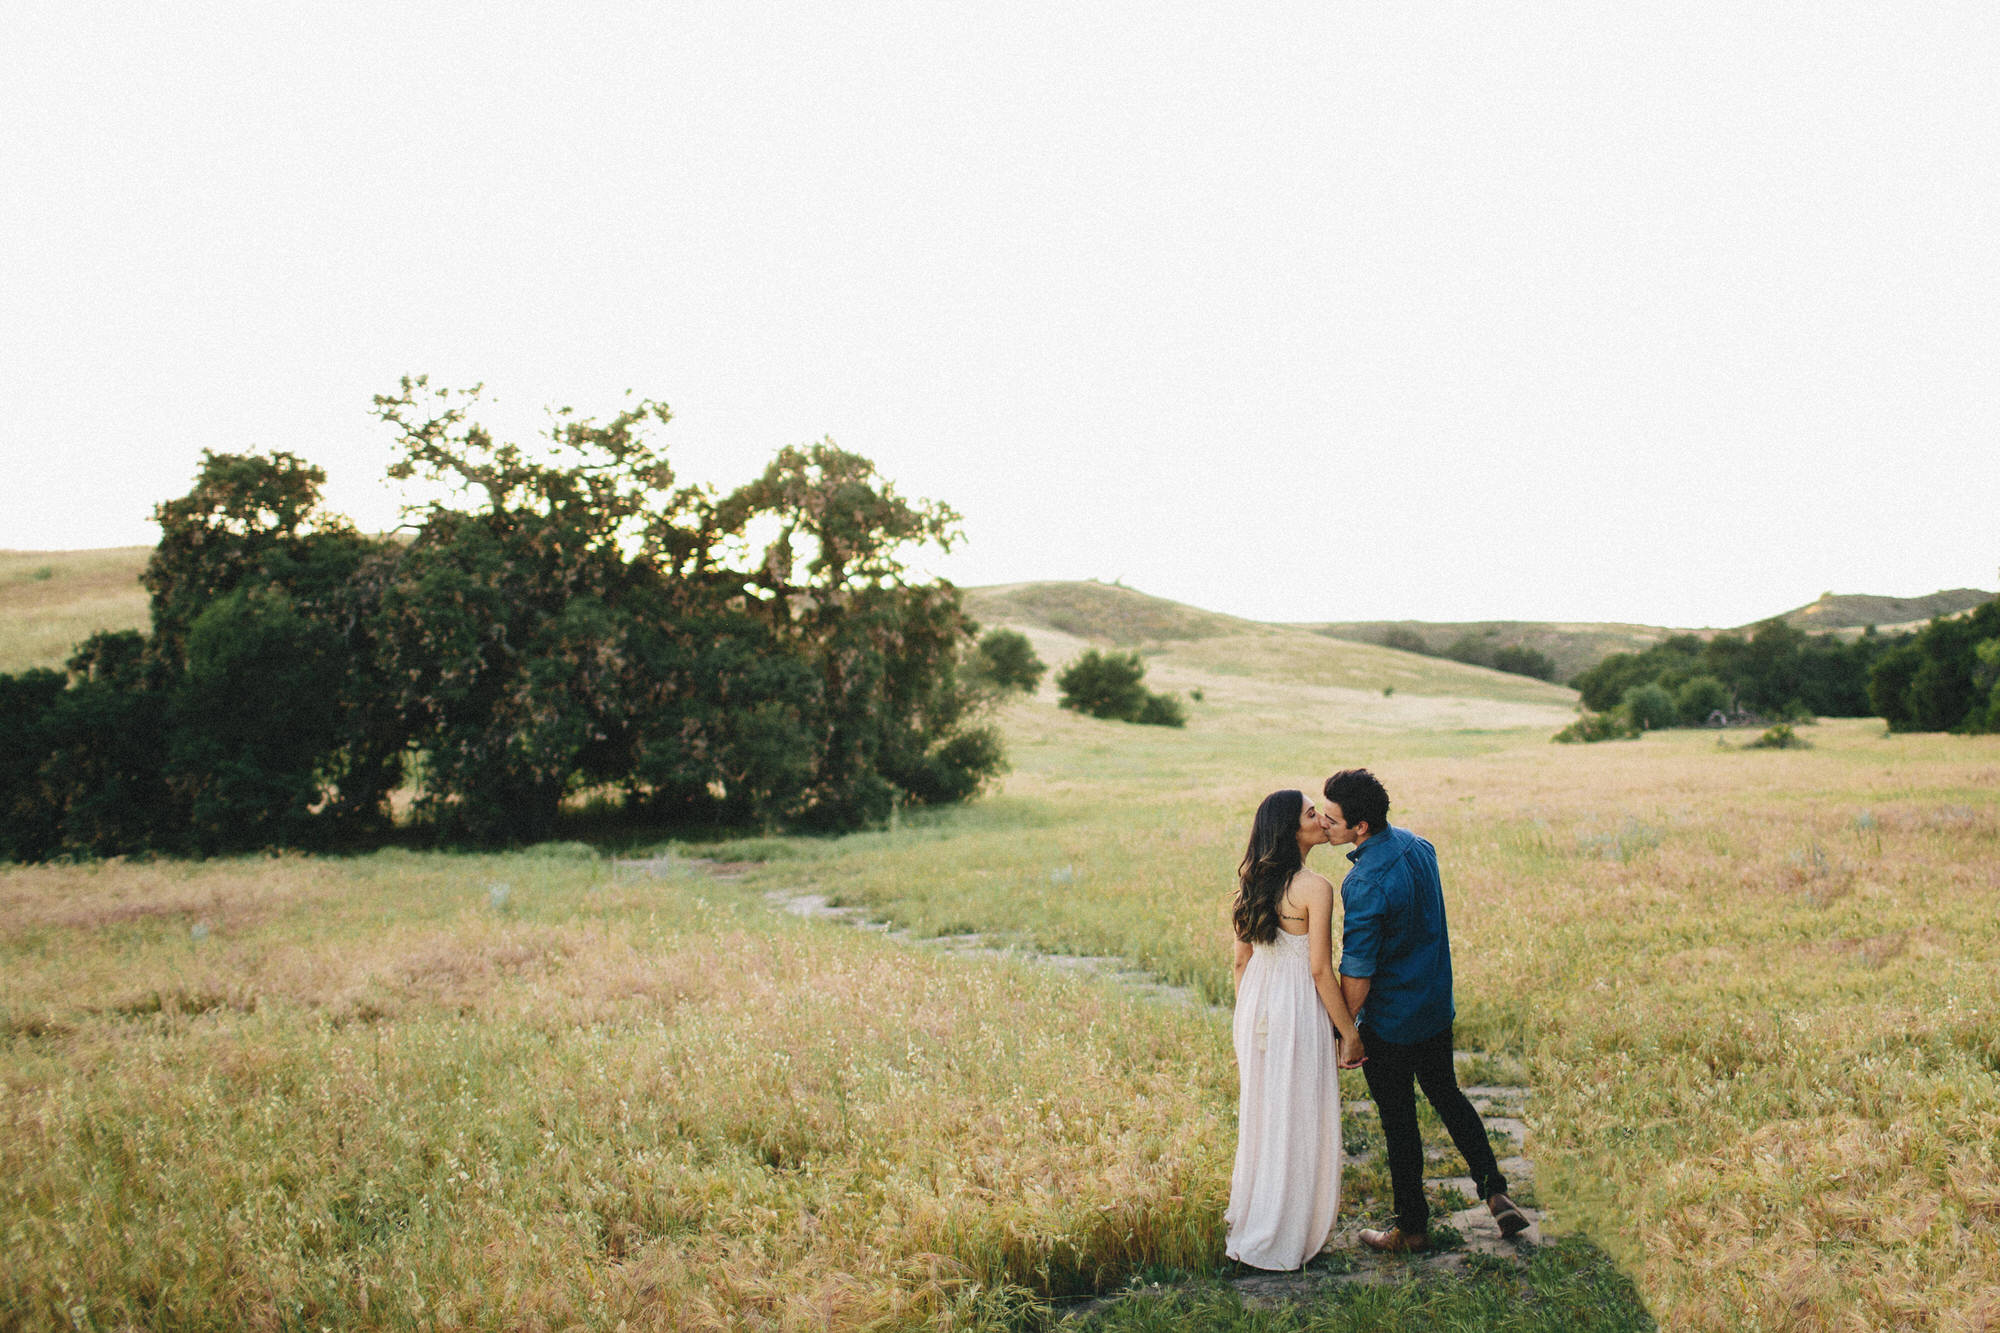 romantic-engagement-20.jpg